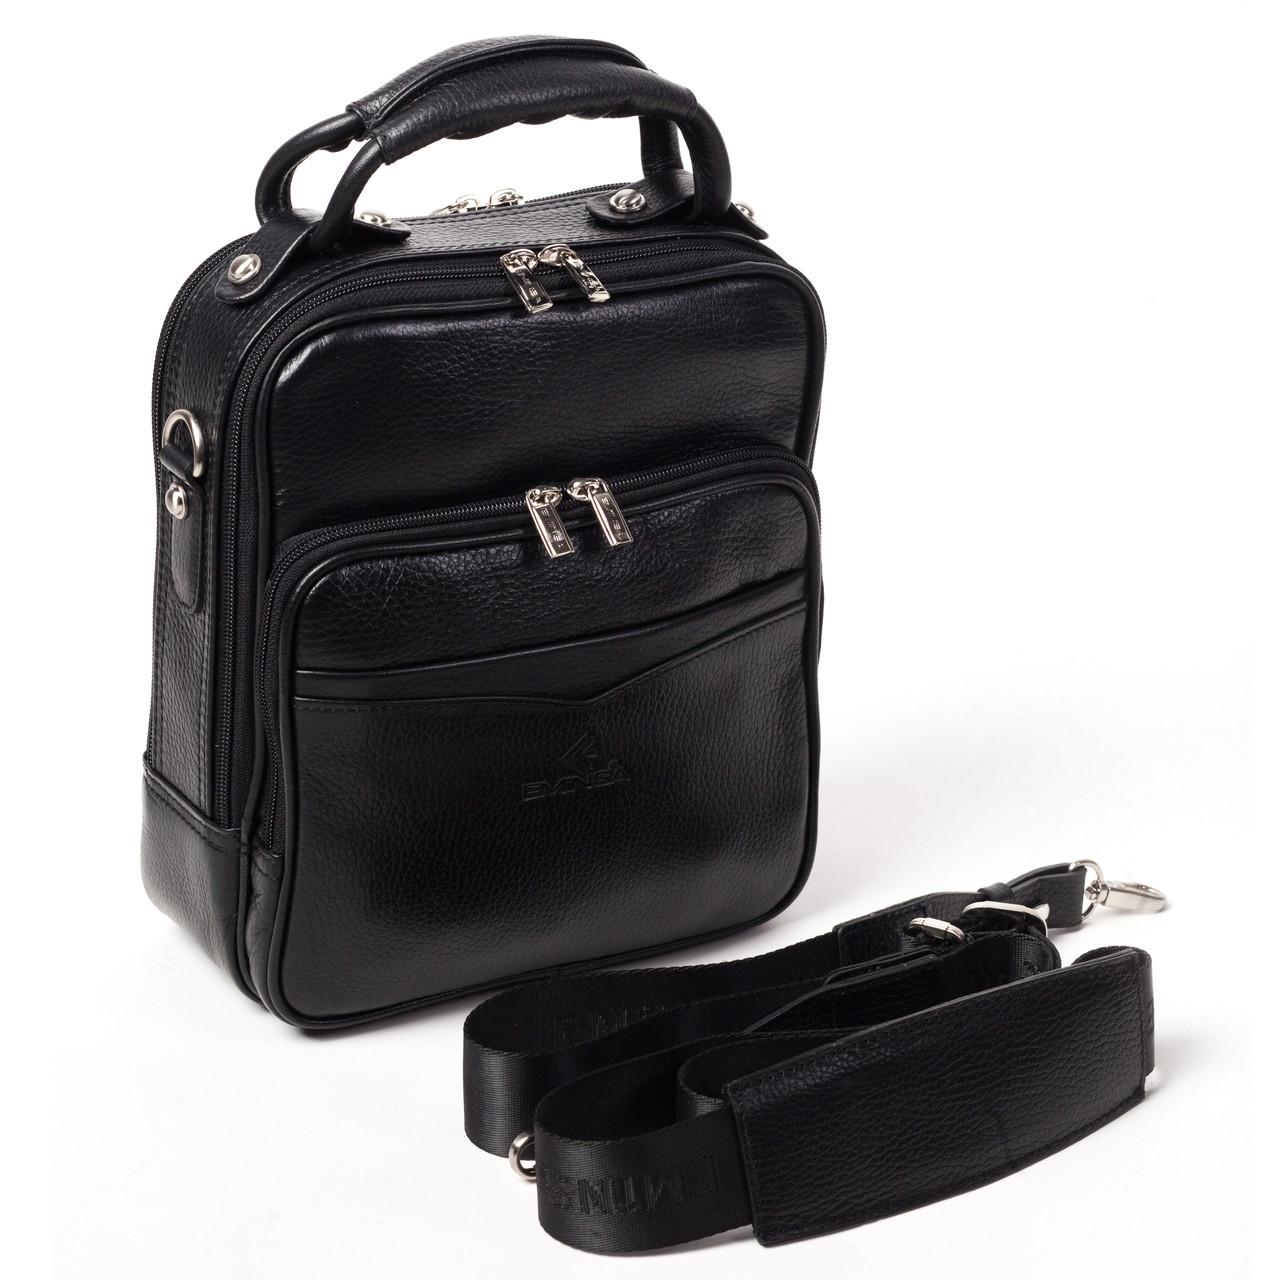 Мужская сумка кожаная черная Eminsa 6006-18-1